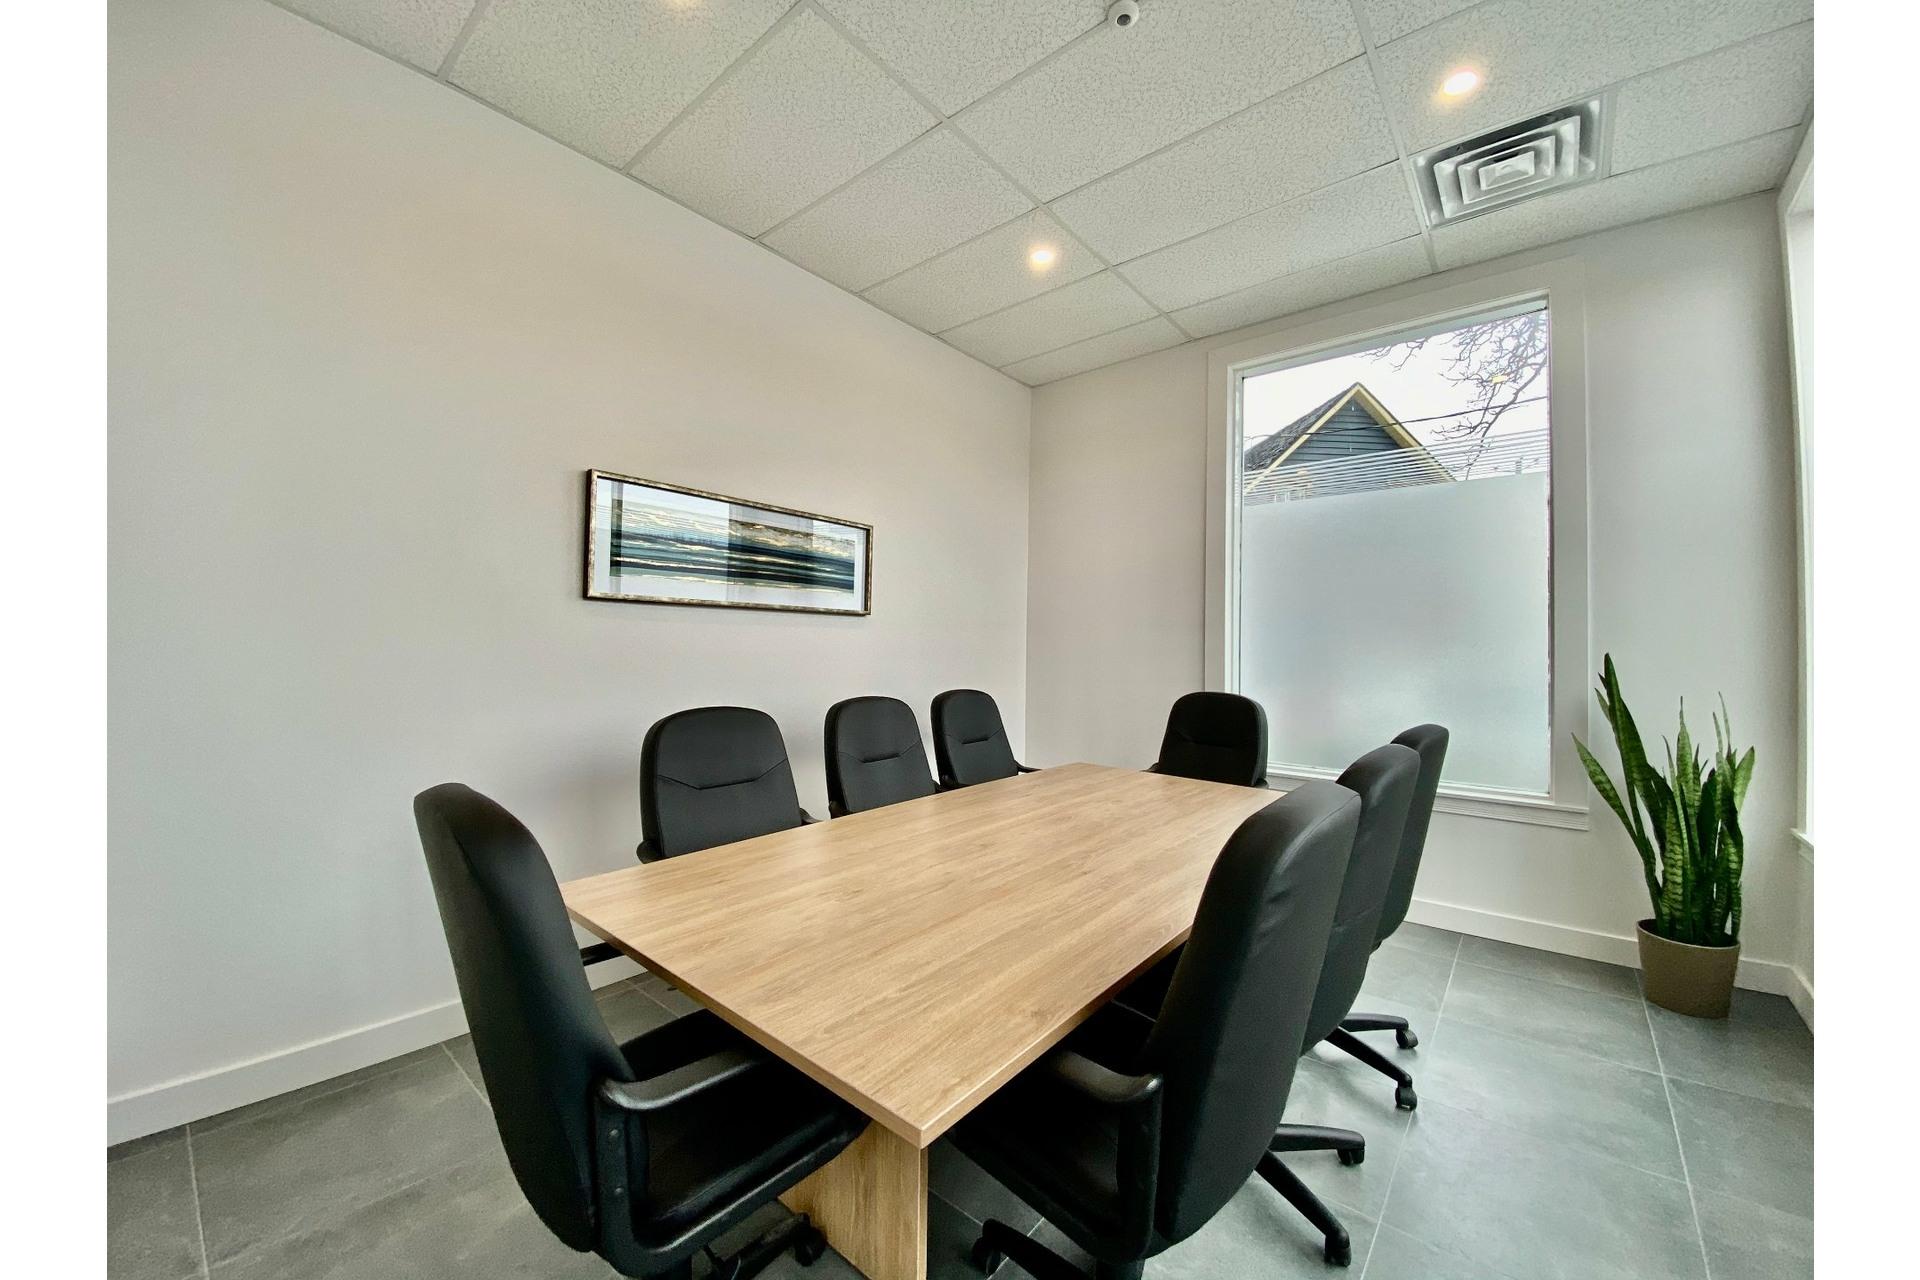 image 3 - MX - Oficina - MX Para alquiler Pierrefonds-Roxboro Montréal